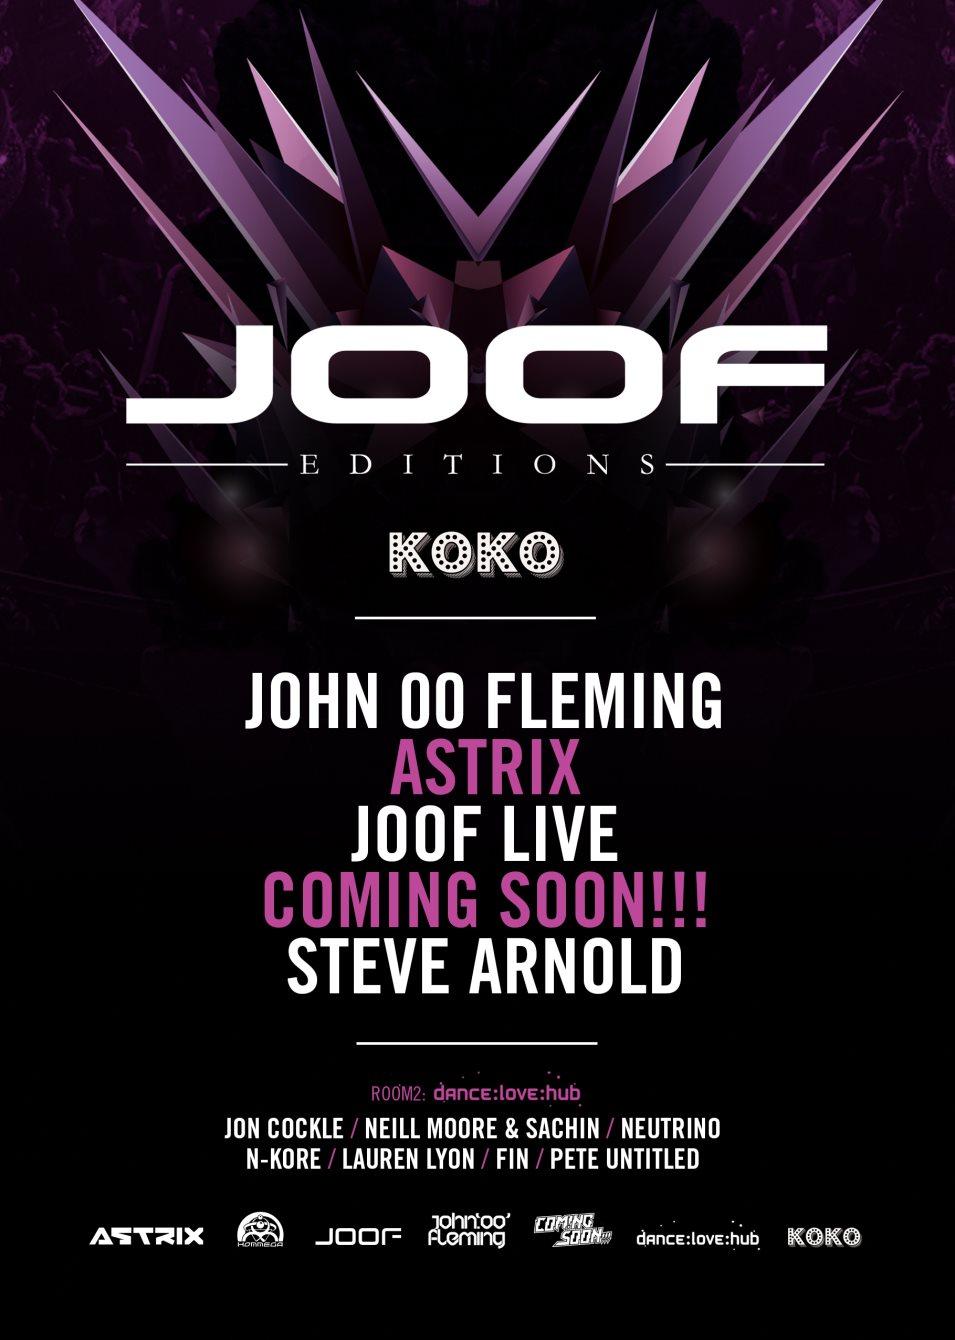 Joof Editions - Flyer back